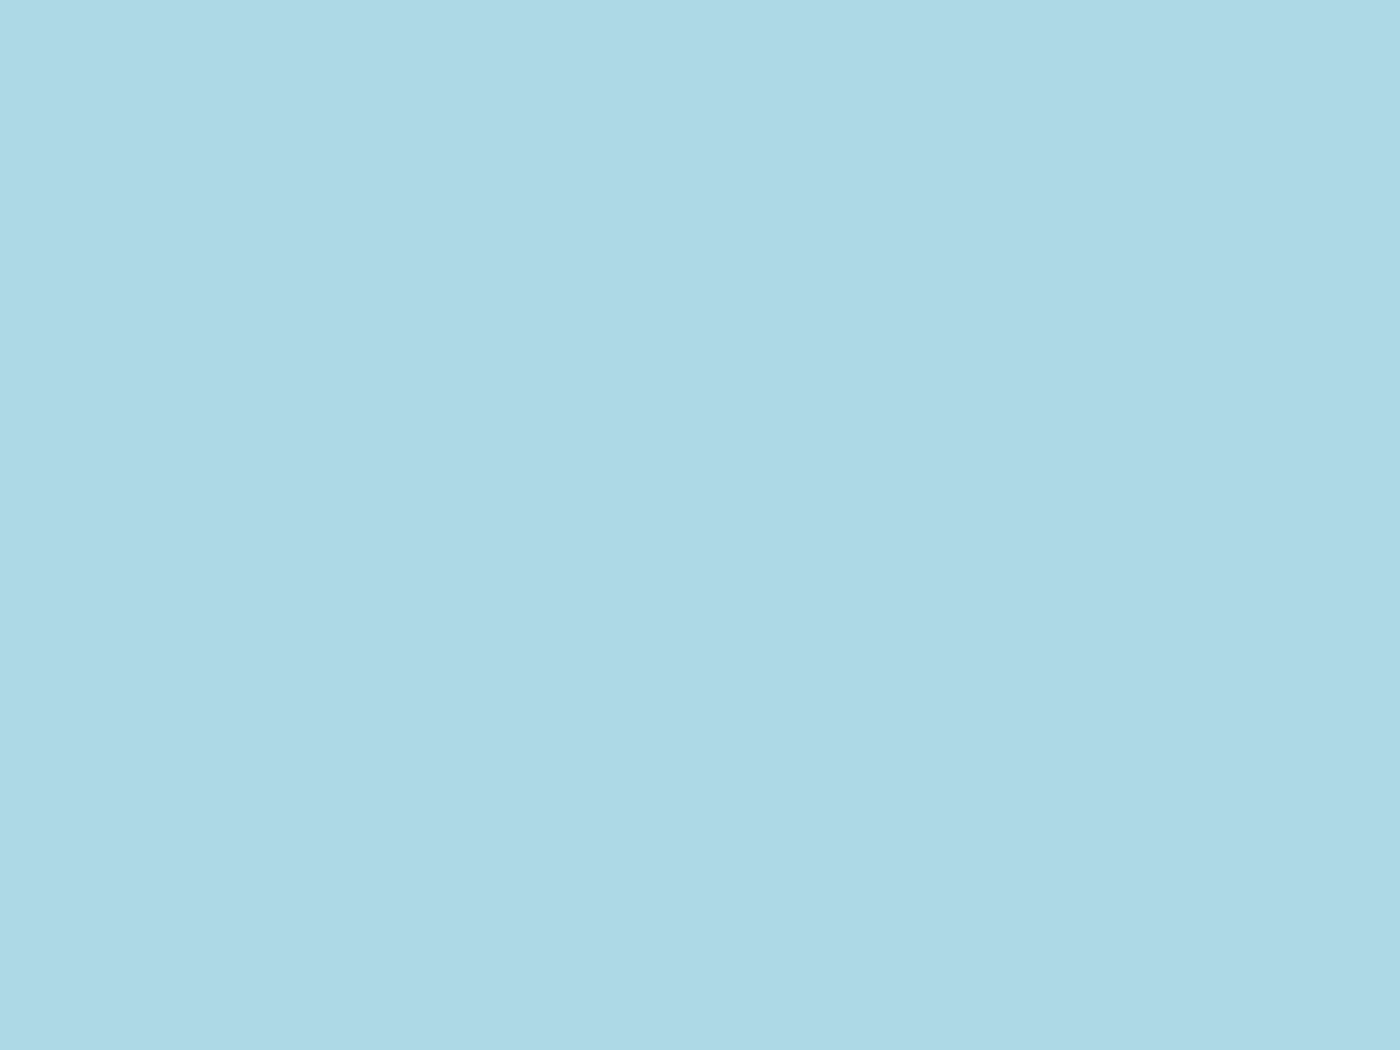 1400x1050 Light Blue Solid Color Background